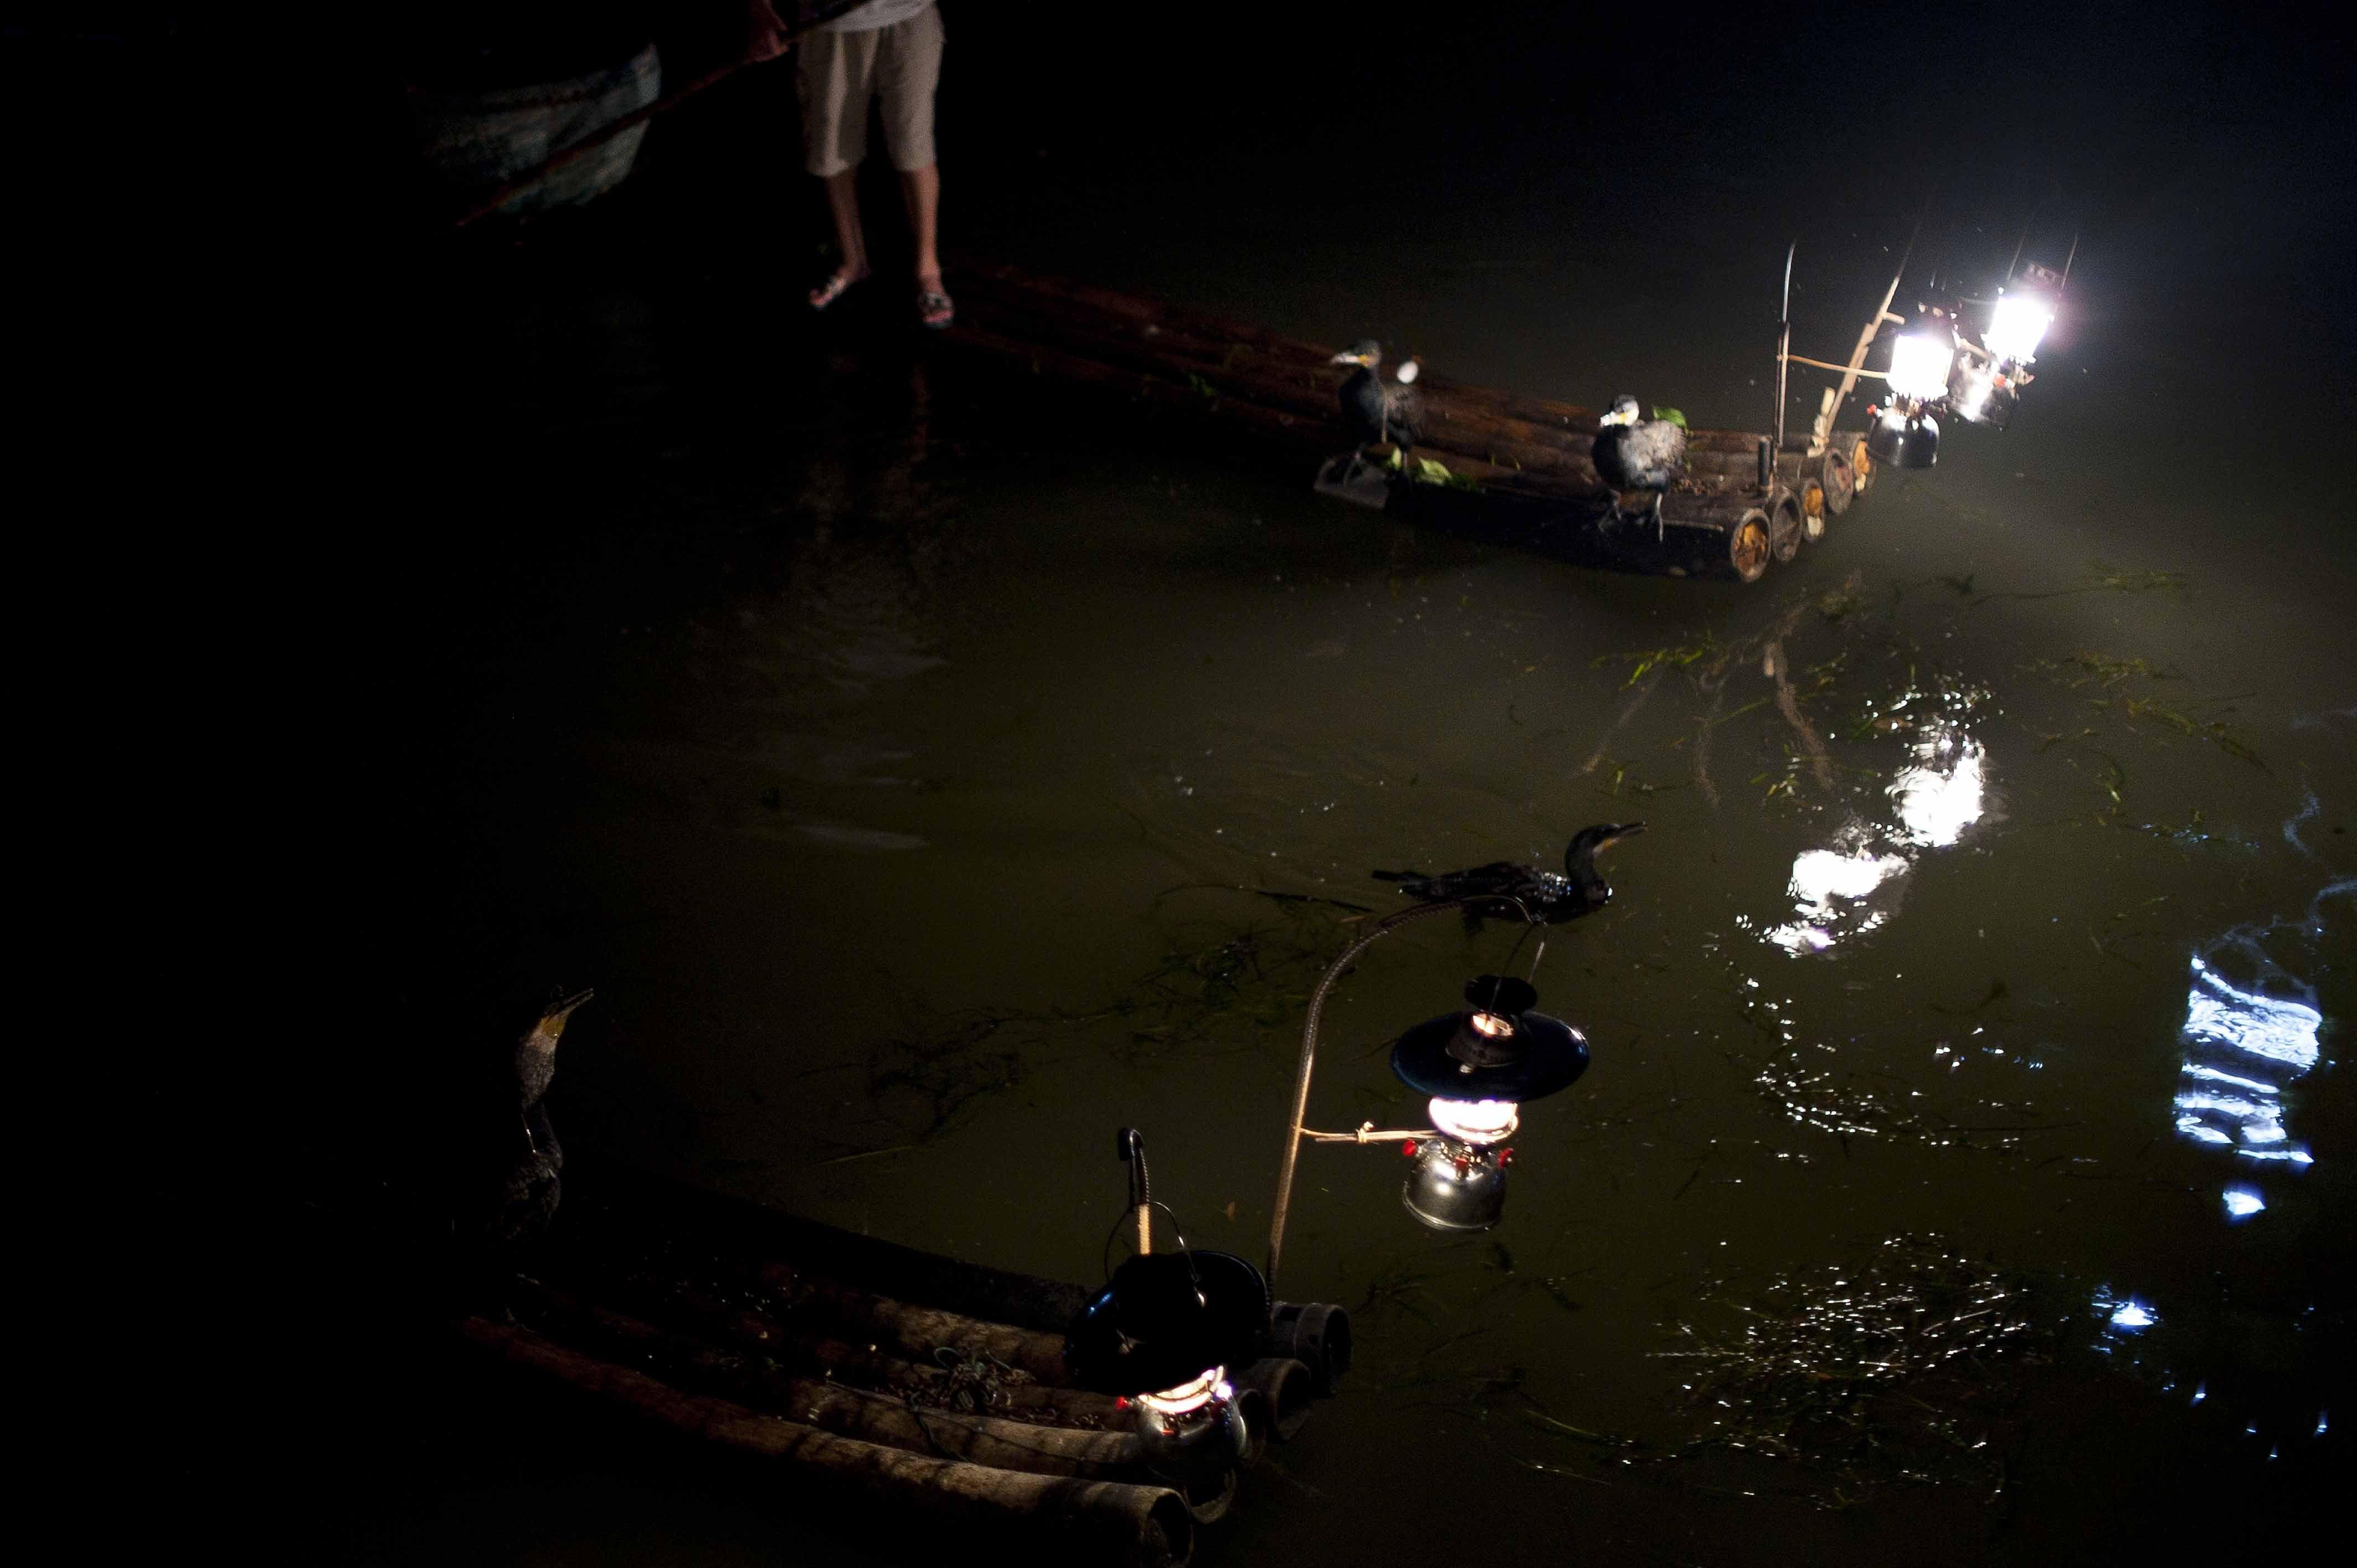 Pesca con cormoránes, pesca nocturna, Guilin, China